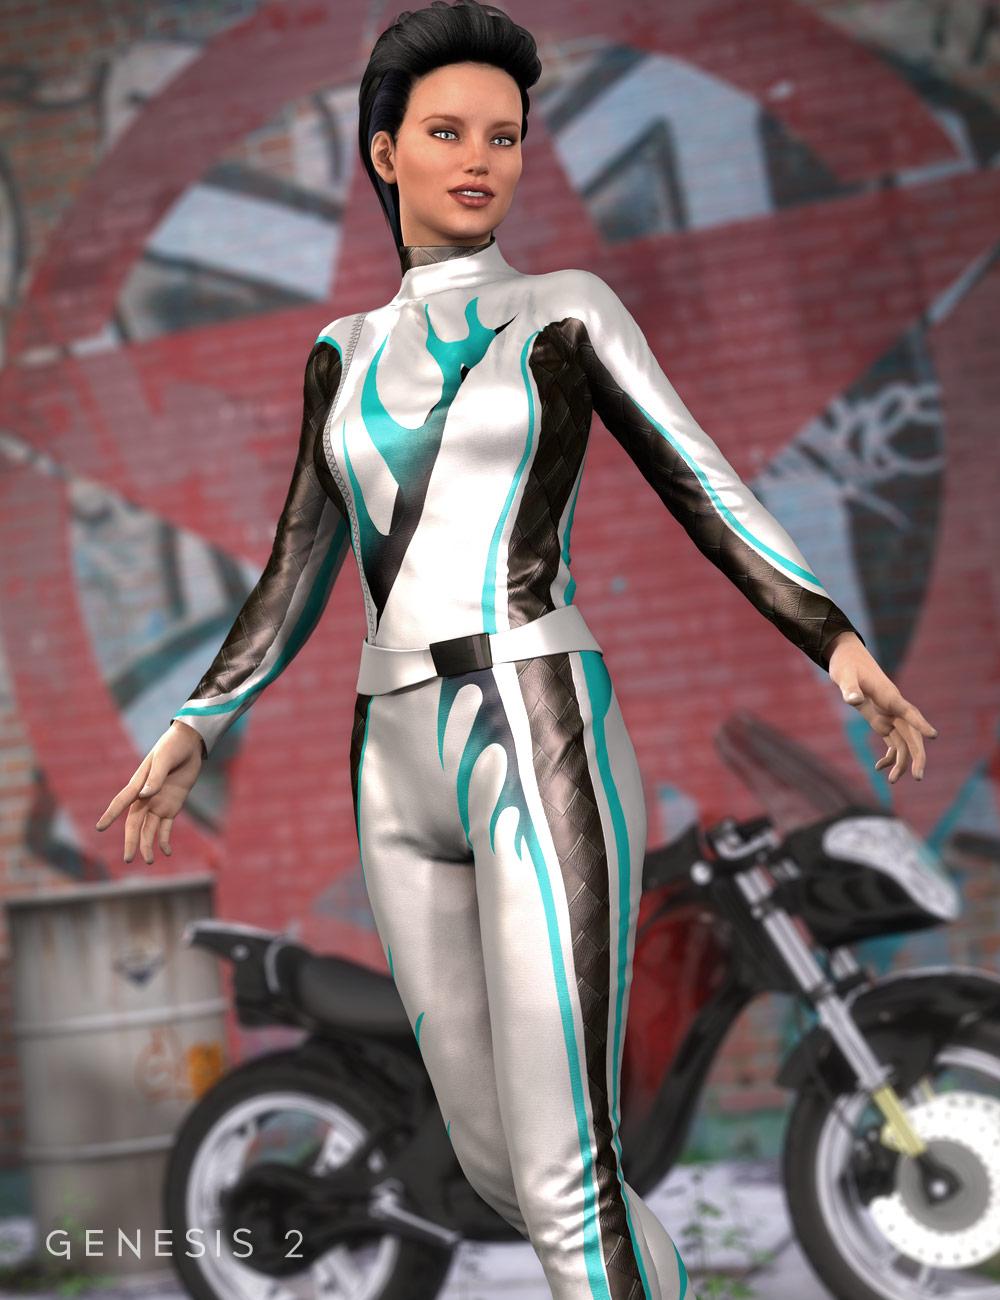 XS Wear For Genesis and Genesis 2 Female(s) by: Cute3D, 3D Models by Daz 3D